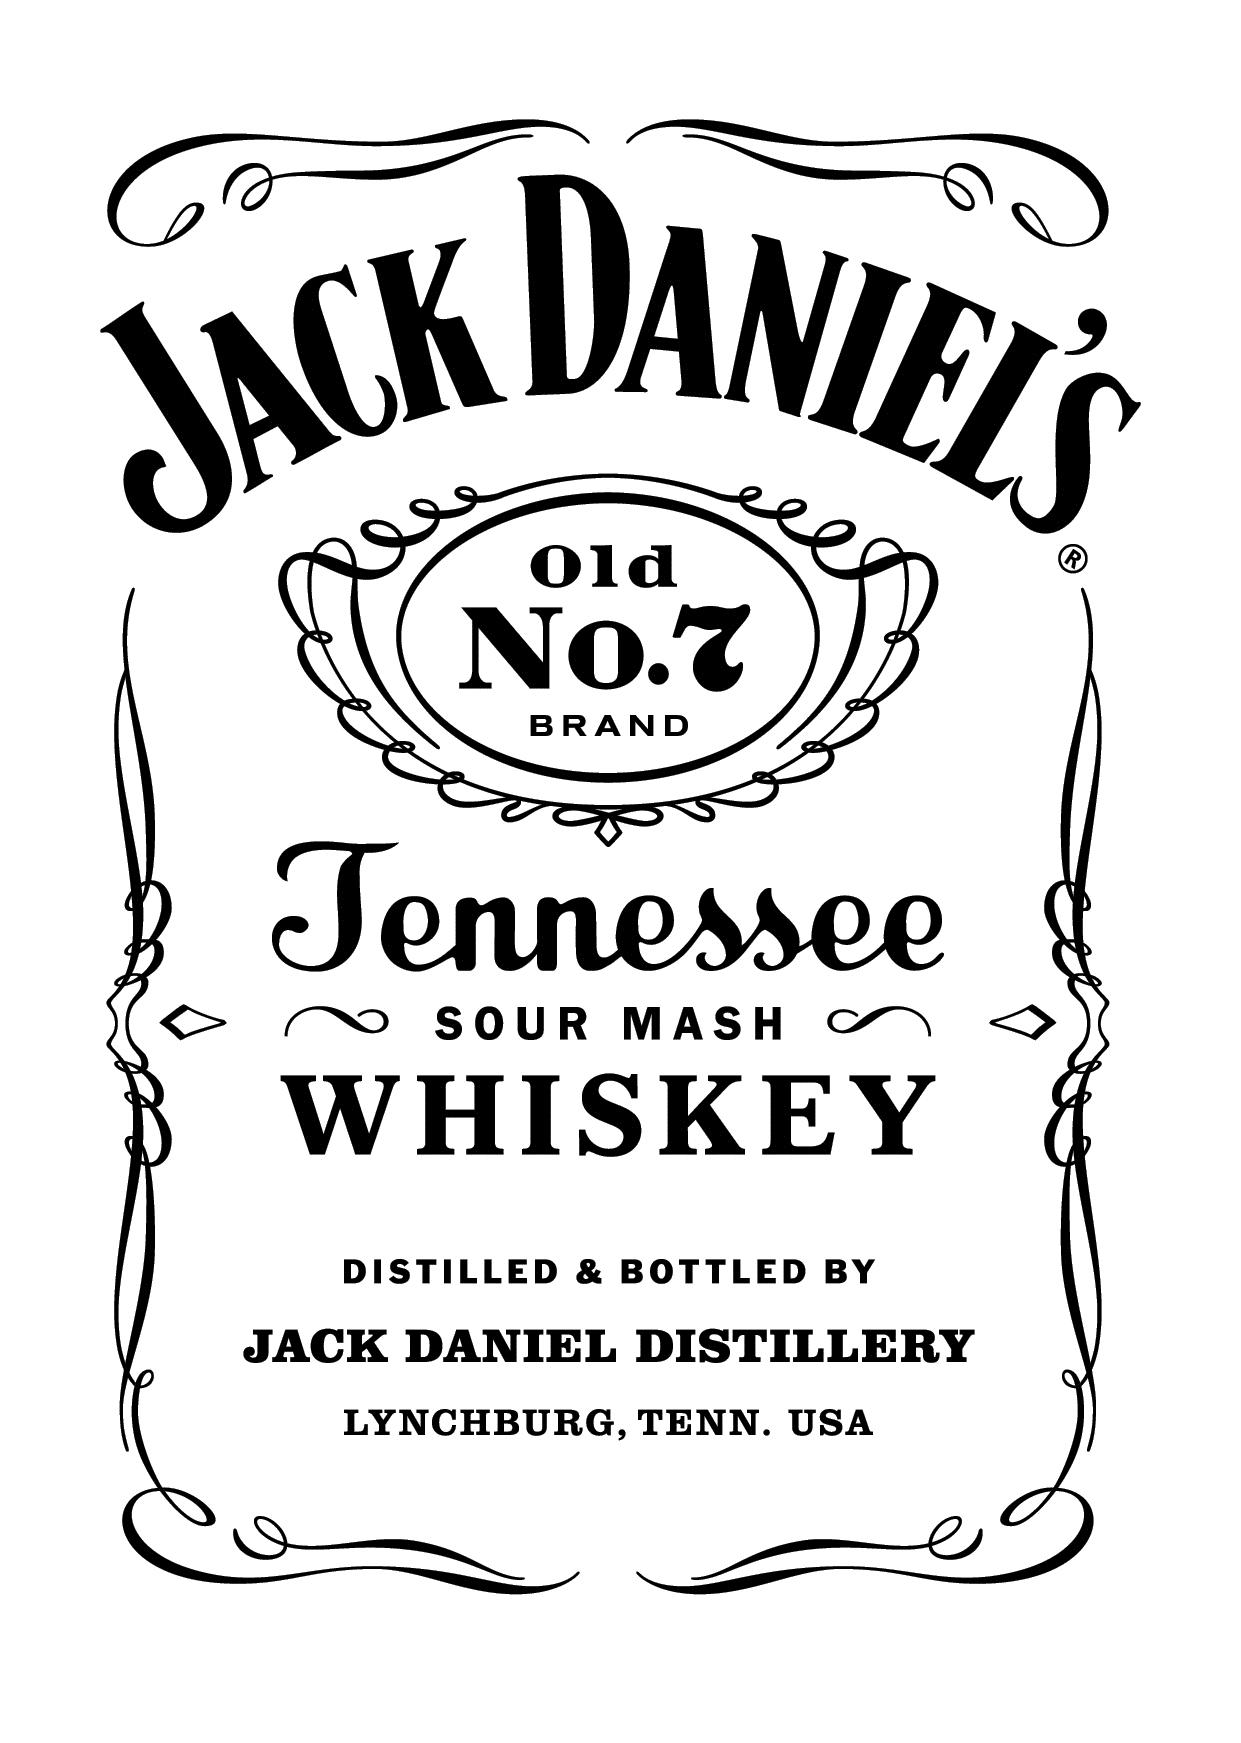 Jack Daniel's Old No. 7.